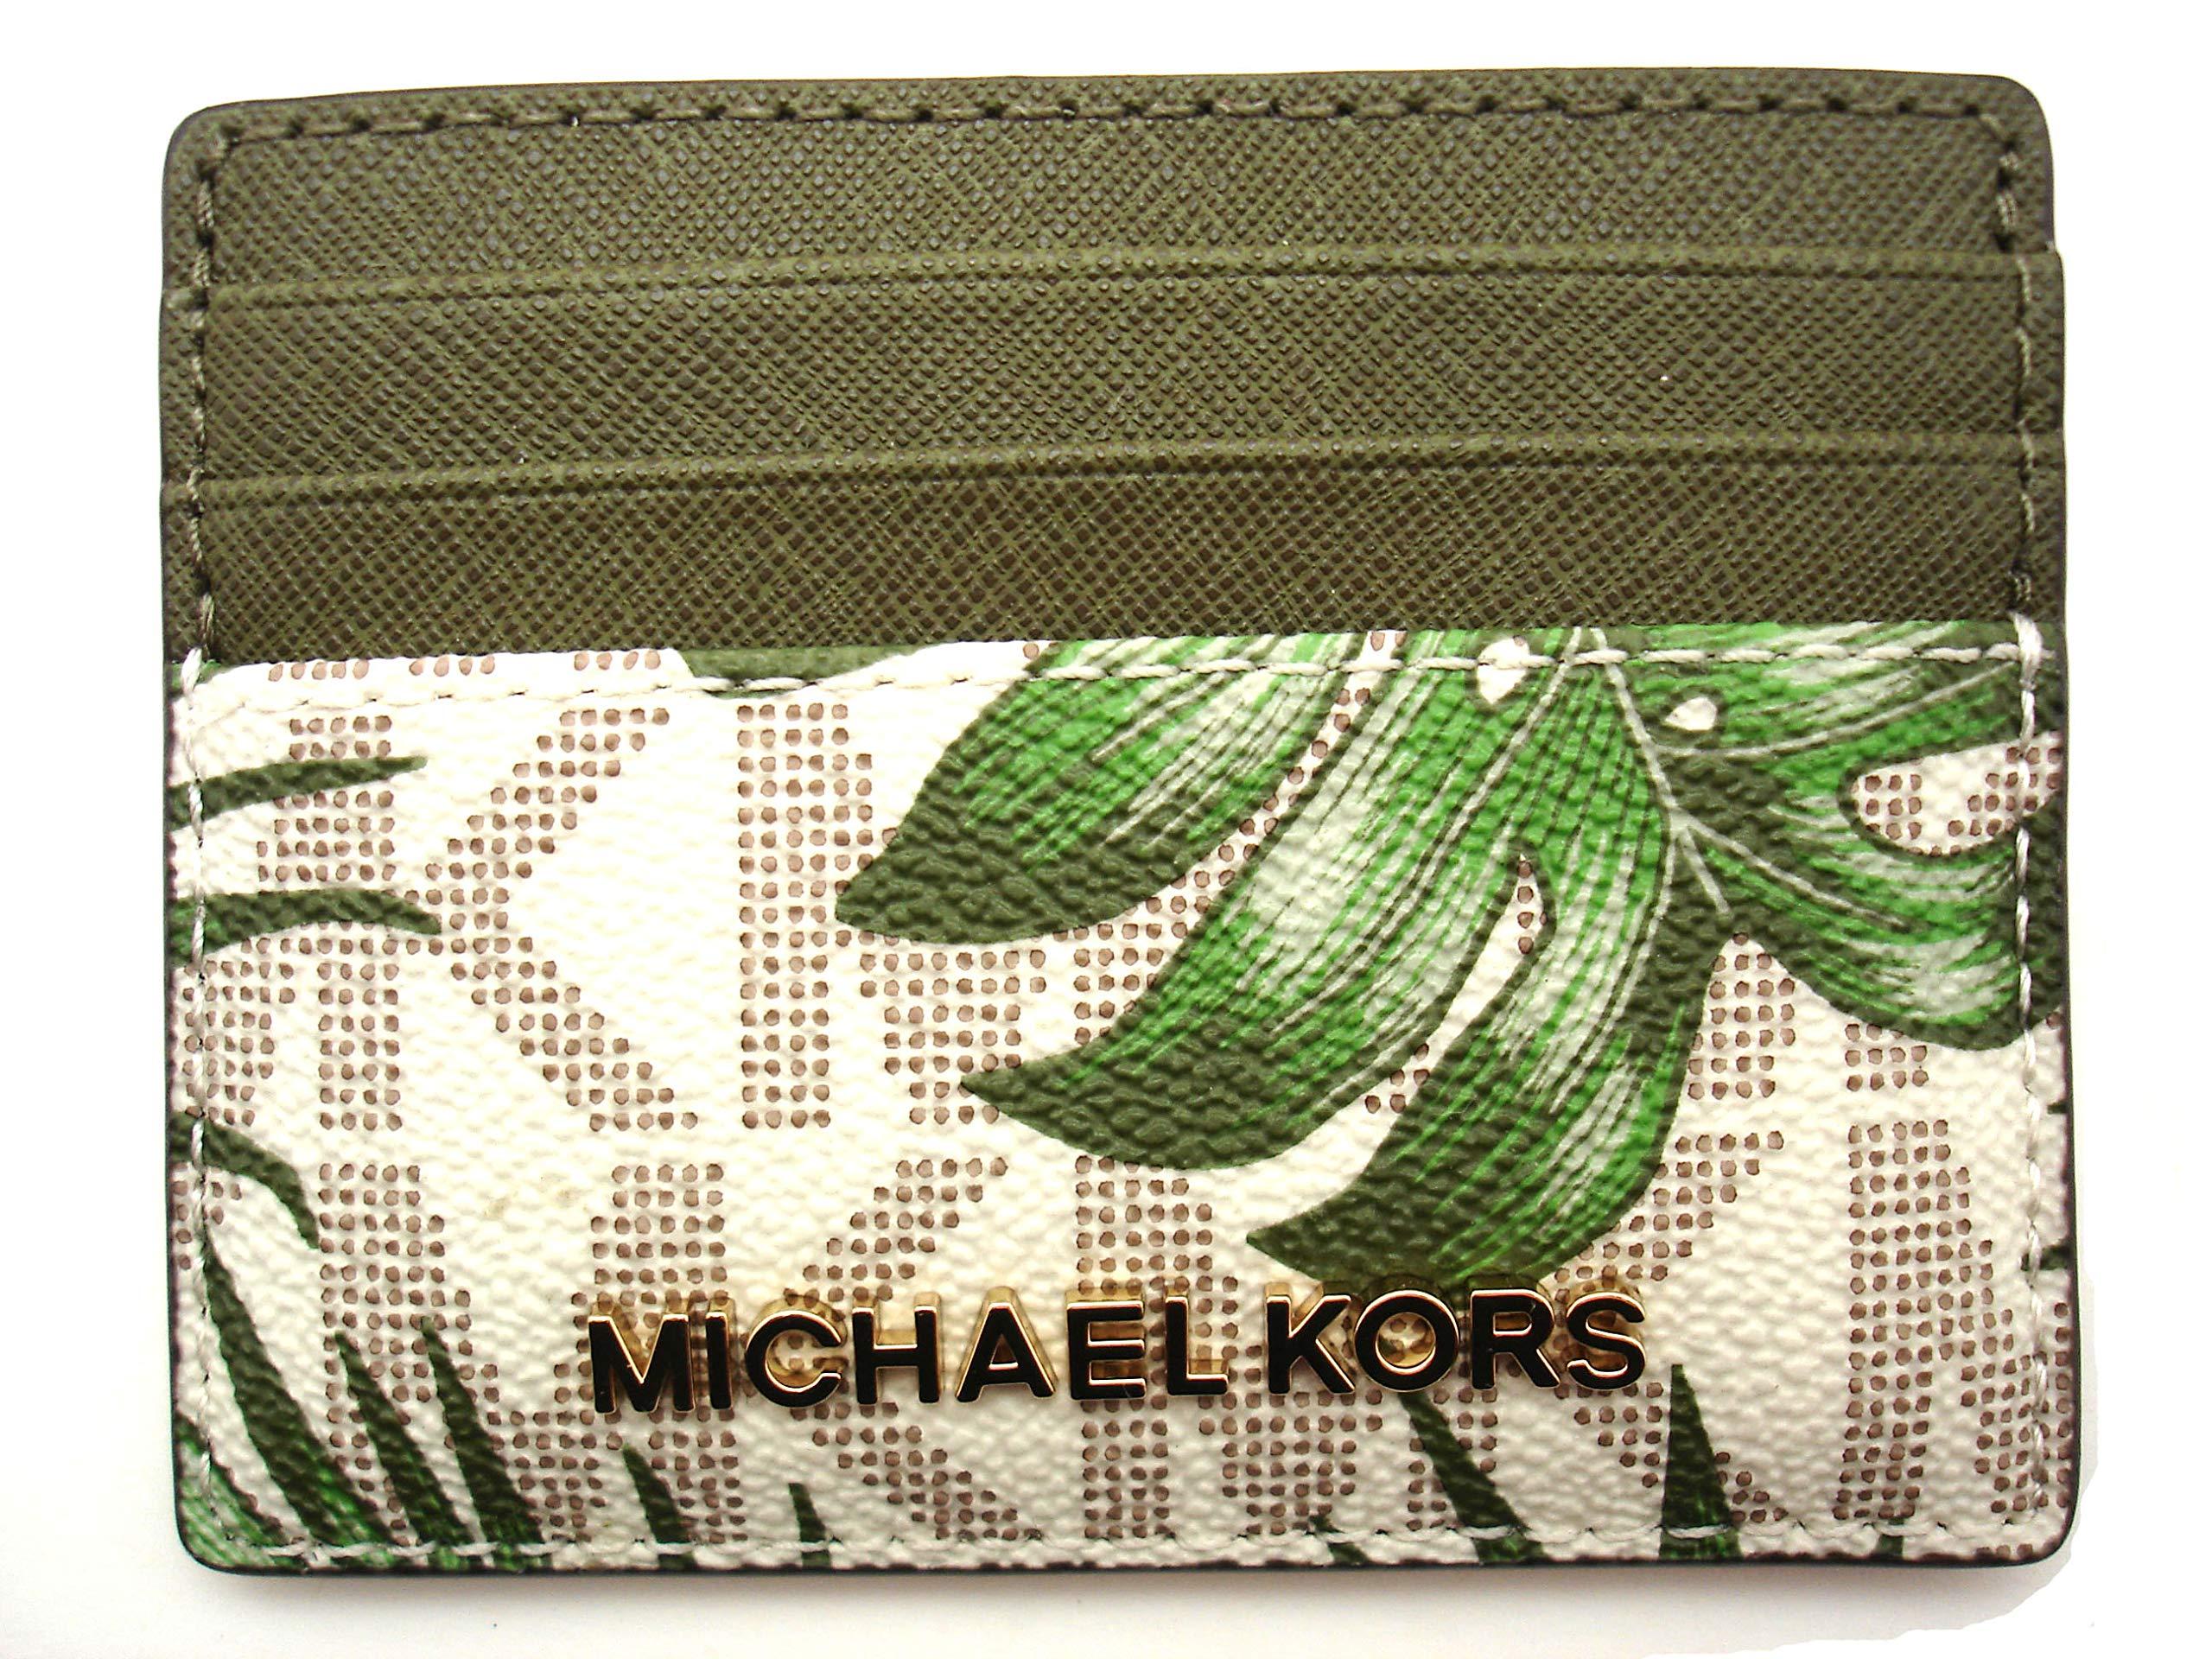 quality design f4a5e a6a63 MICHAEL Michael Kors Jet Set Travel LG Leather Card Holder Case  (Vanilla/Olive MK Signature)